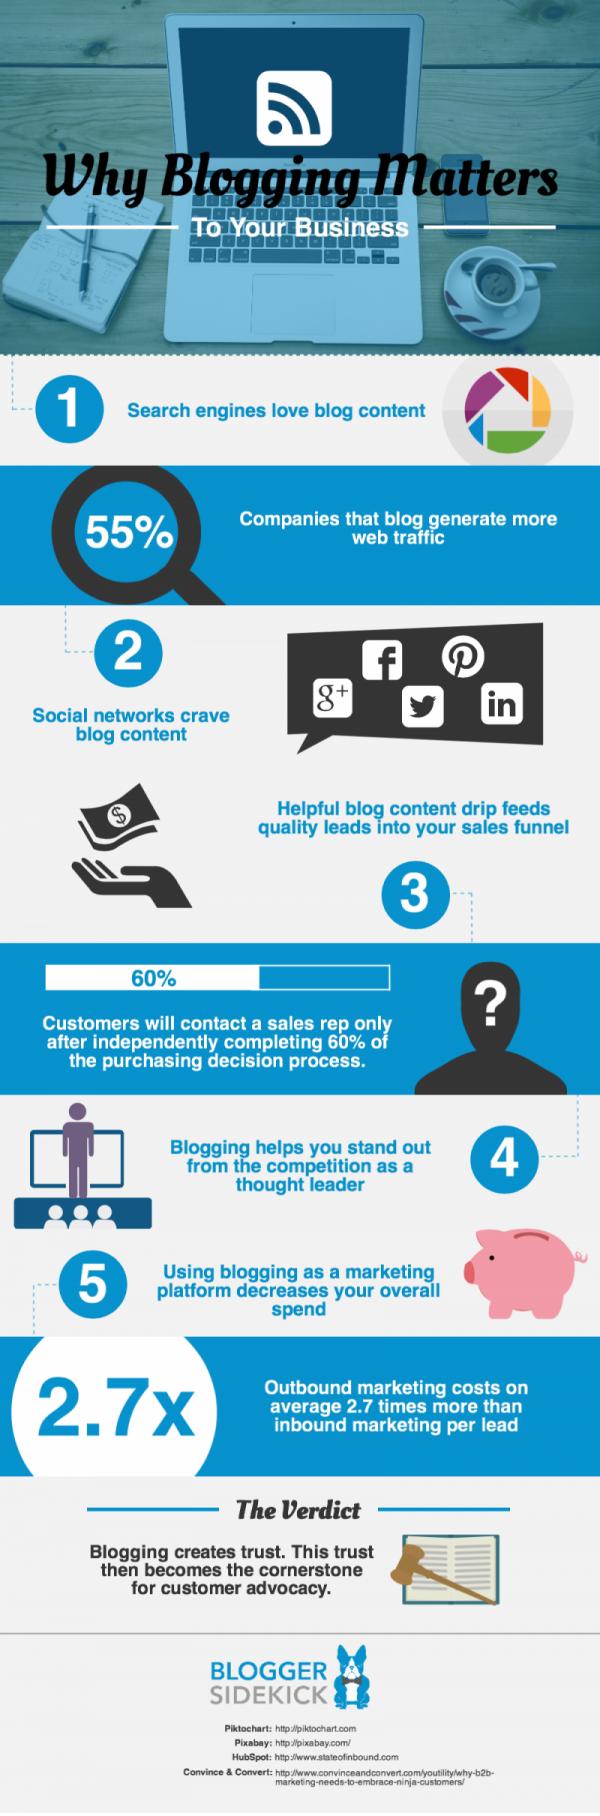 Why-Blogging-Matters-creditBloggerSideKick-postedCuttingEdgeBlog-MHProNews-